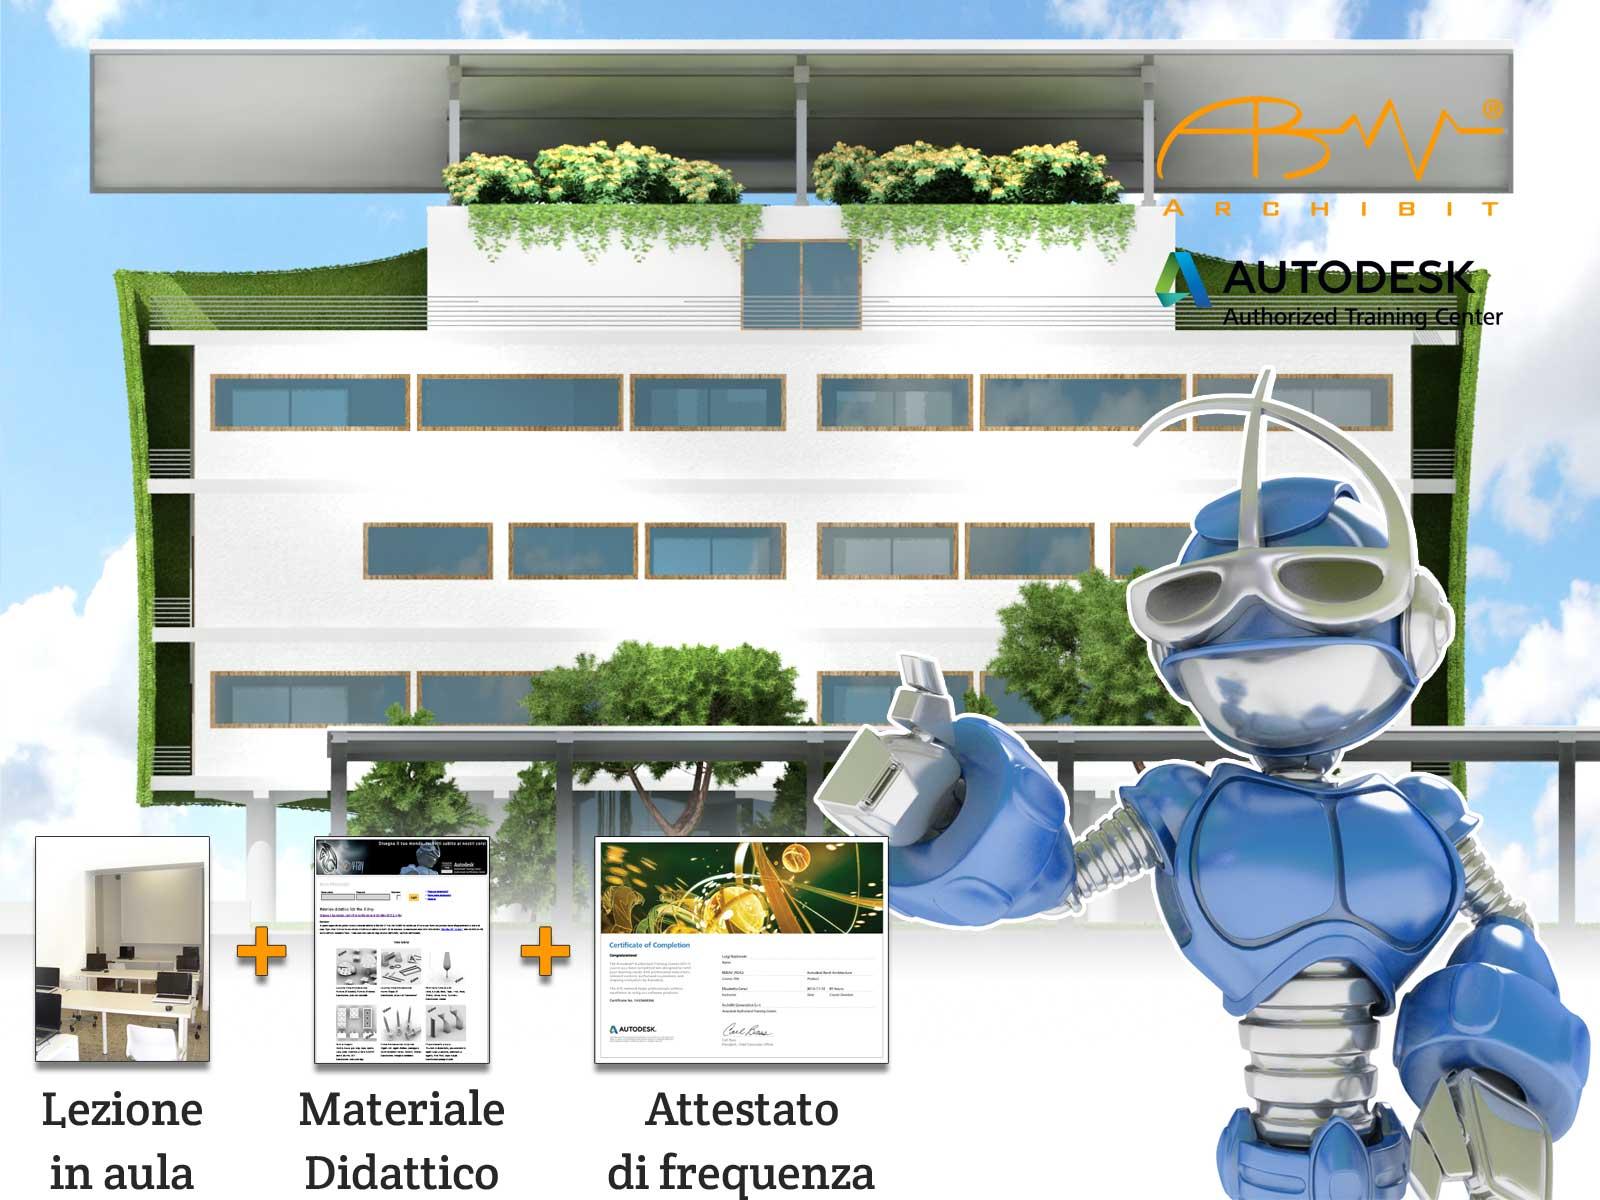 Corso Revit MEP - Archibit Generation centro corsi Autodesk Roma